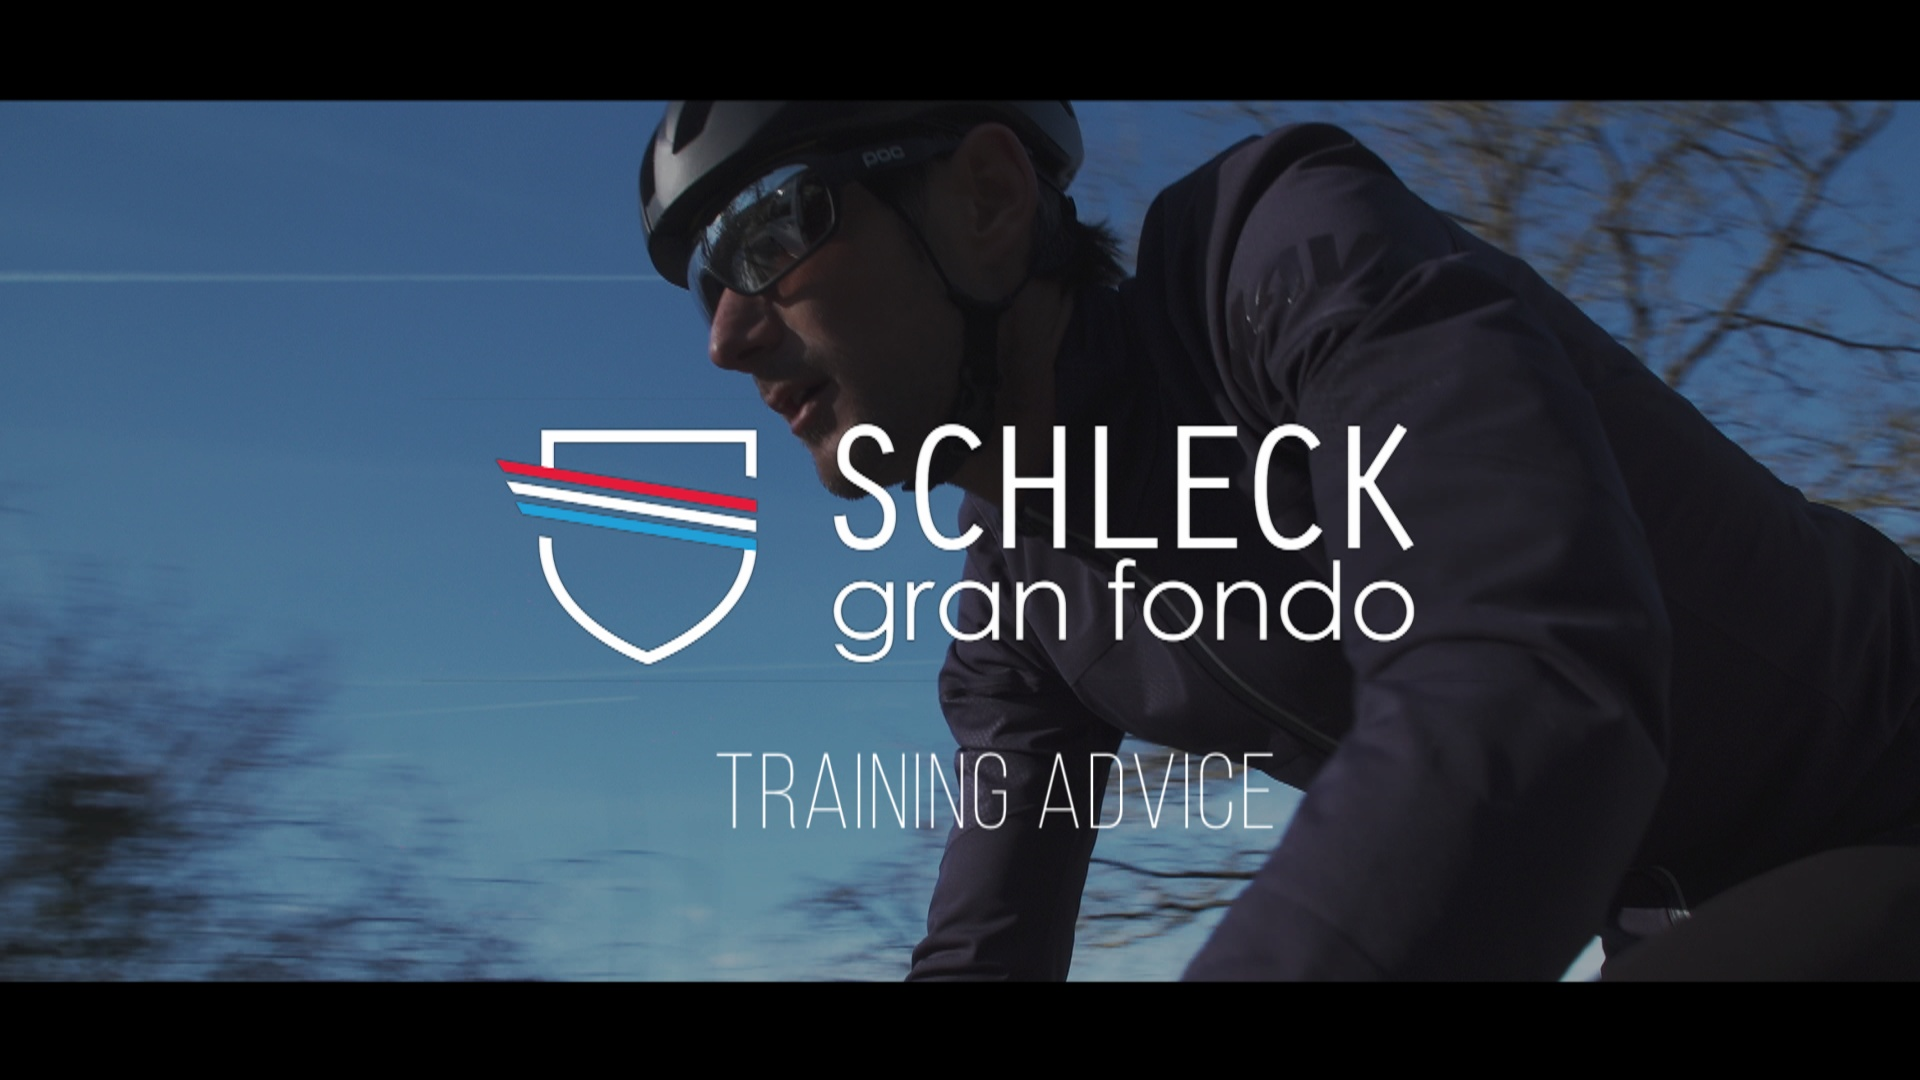 Gran Fondo Frank Schleck recrute des bénévoles